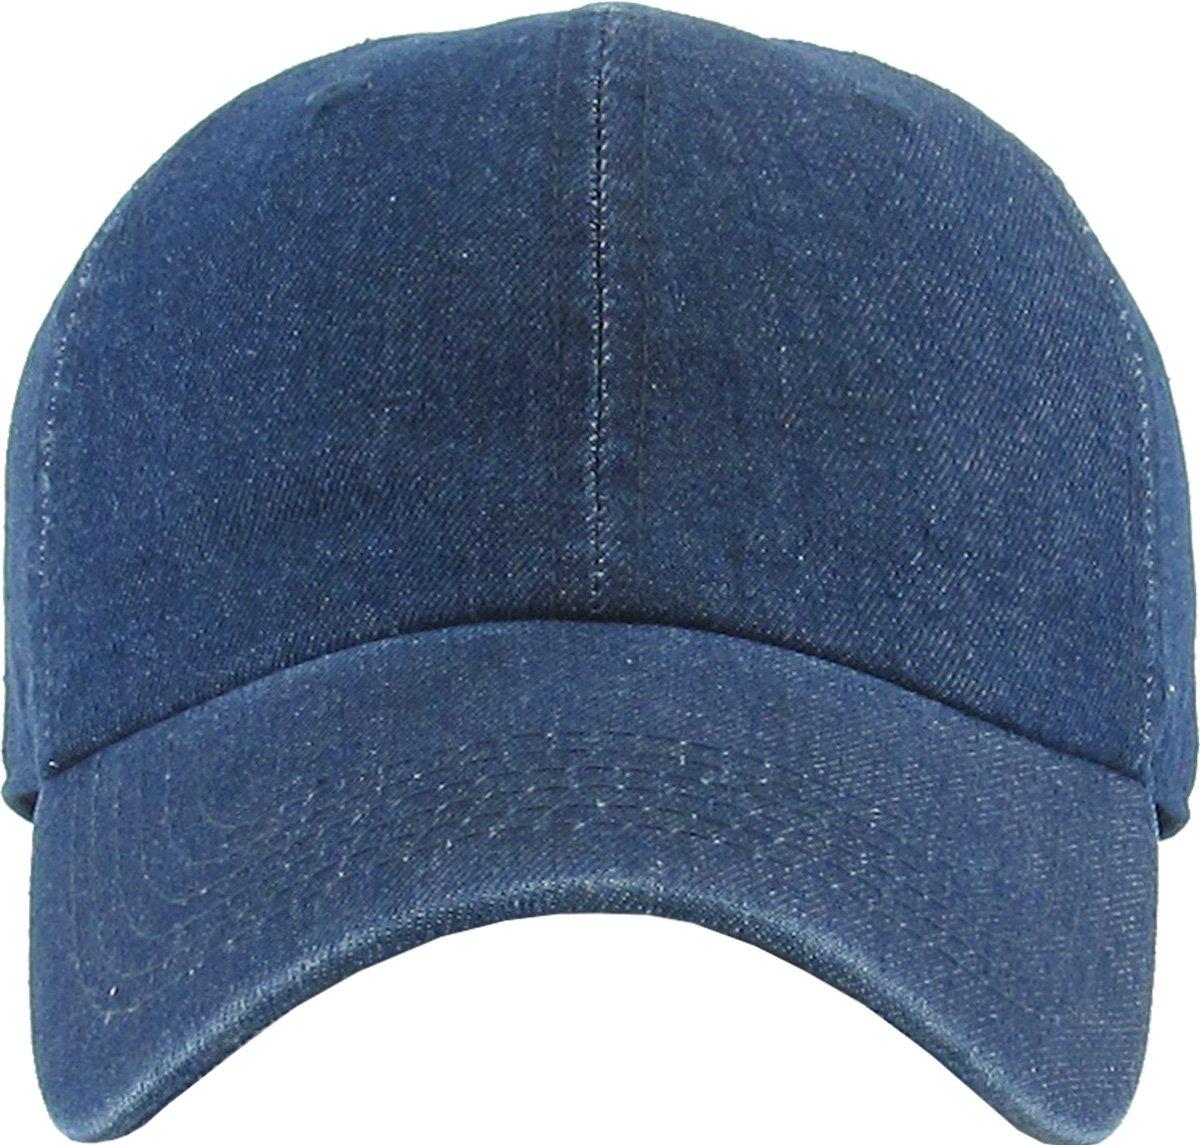 e172e641f76 KBETHOS Classic Polo Style Baseball Cap All Cotton Made Adjustable Fits Men  Women Low Profile Dad